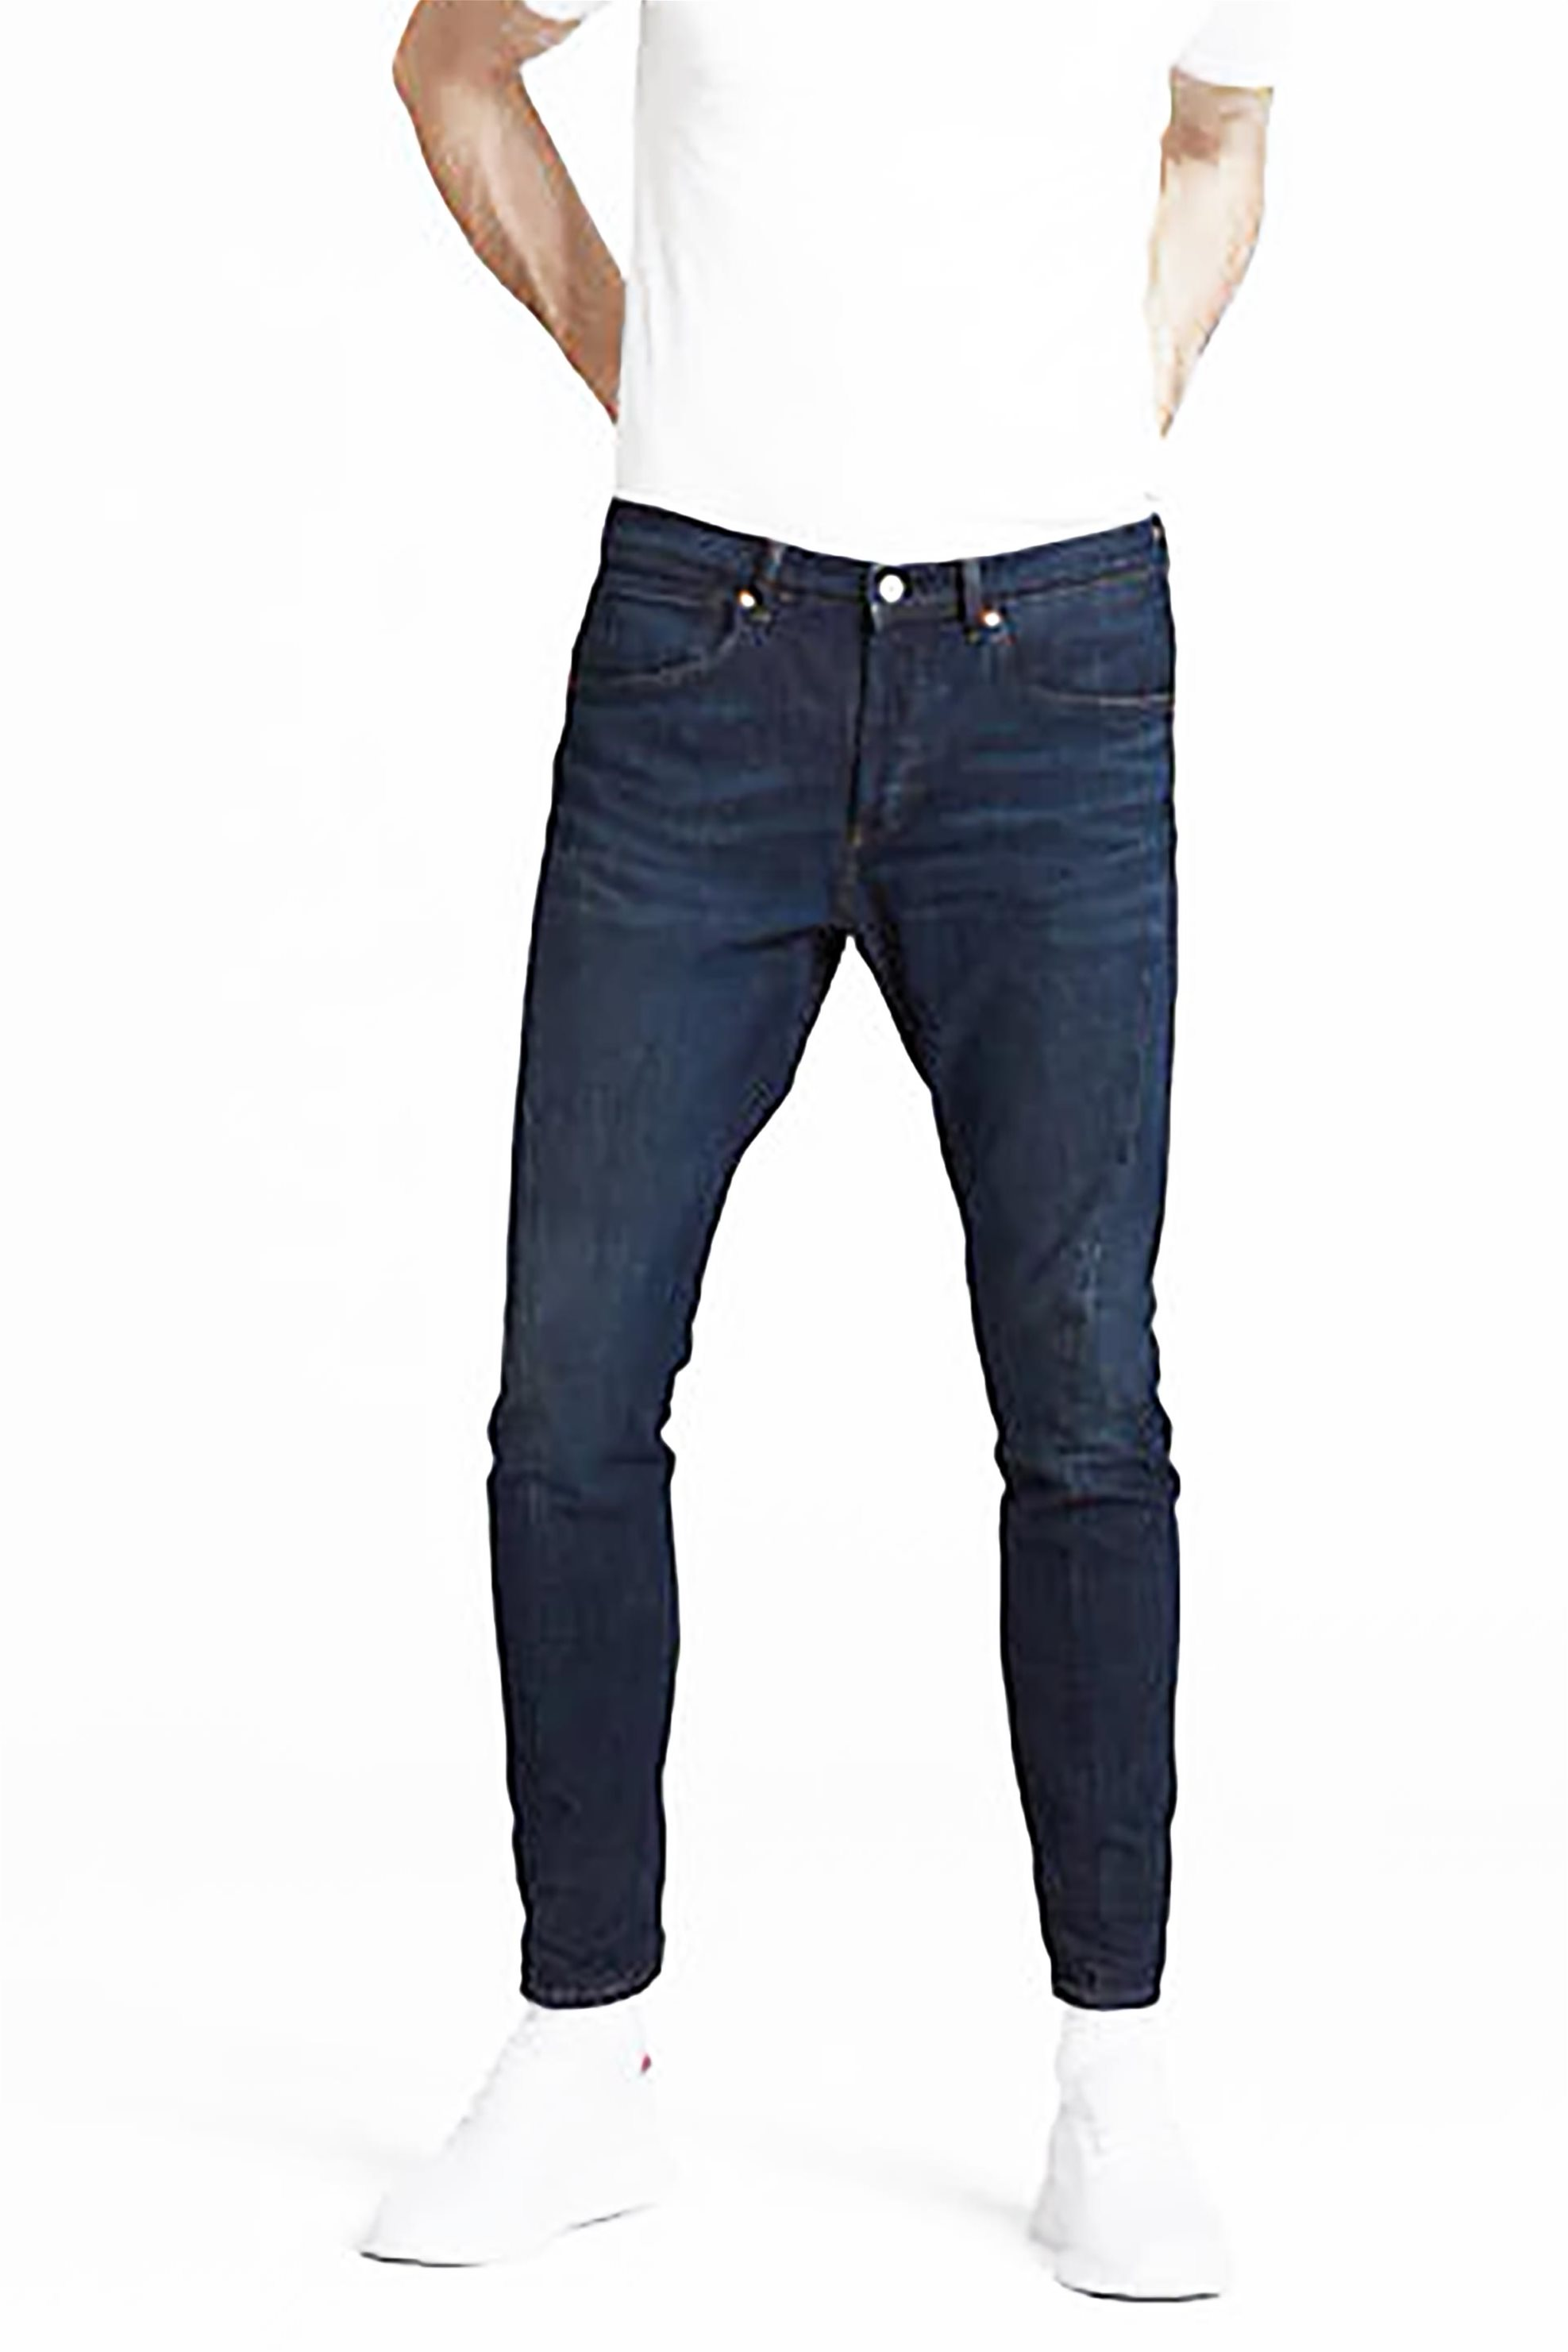 Levi's® ανδρικό τζην παντελόνι 512™ Slim Taper Fit 32L - 7490300-03-32 - Μπλε Σκούρο